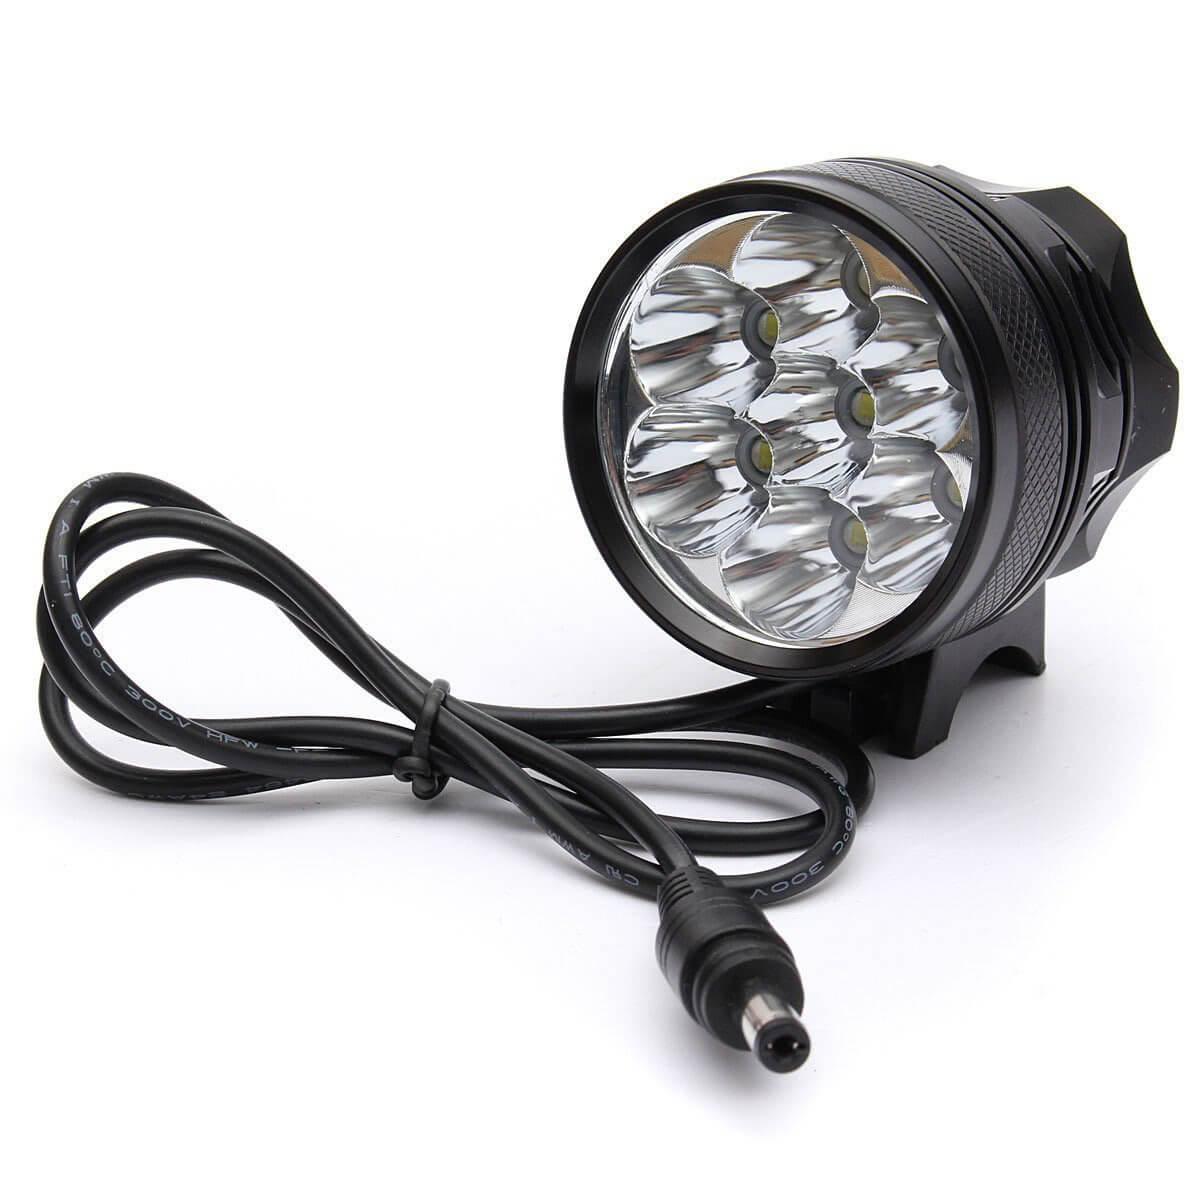 Eariy LED Fahrradlicht, 30000 Lm 12x CREE T6